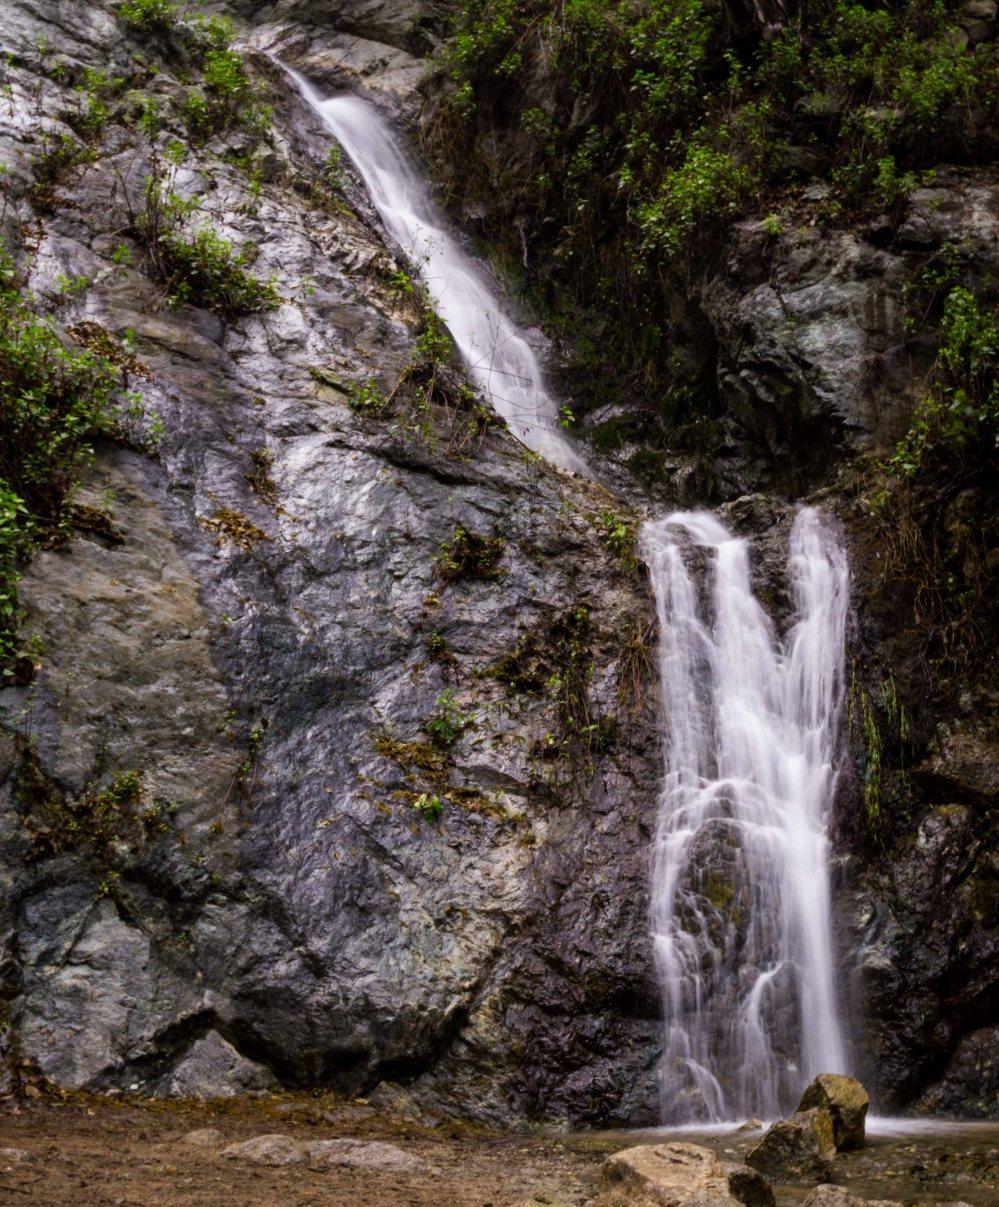 monrovia-falls-17-of-23